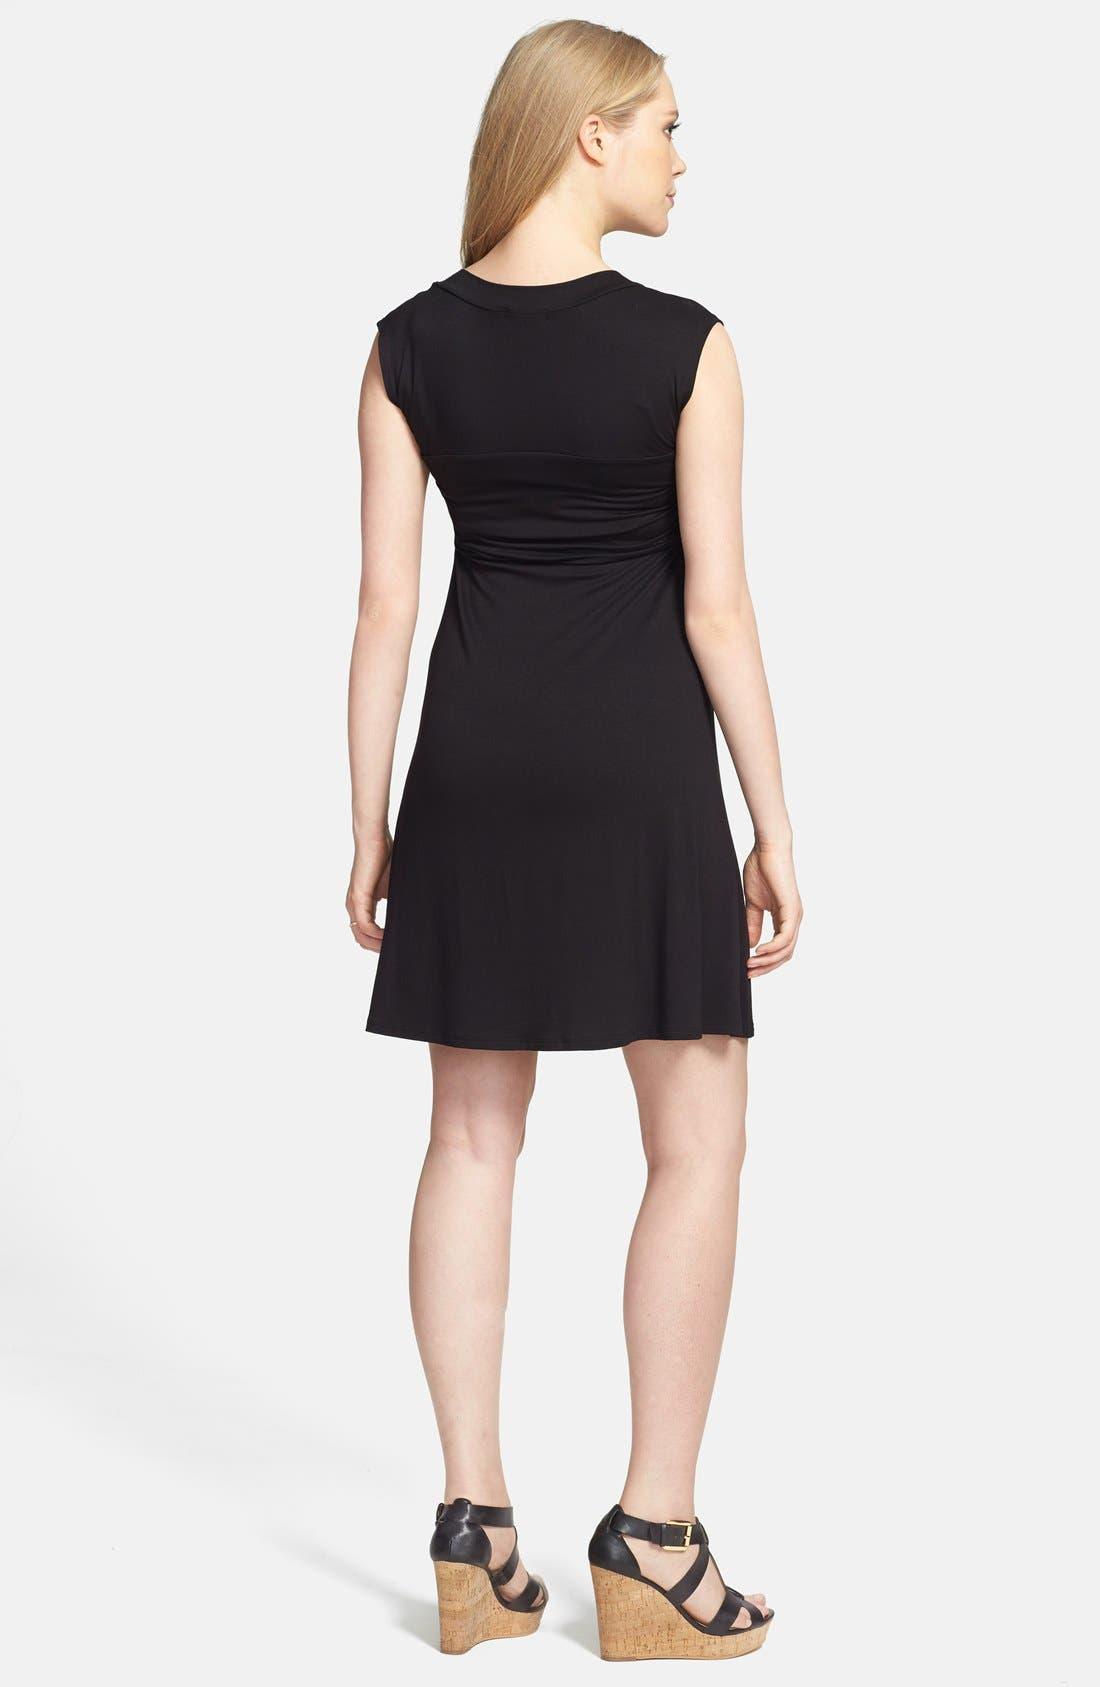 MATERNAL AMERICA, 'Mini Sweetheart' Dress, Alternate thumbnail 2, color, BLACK